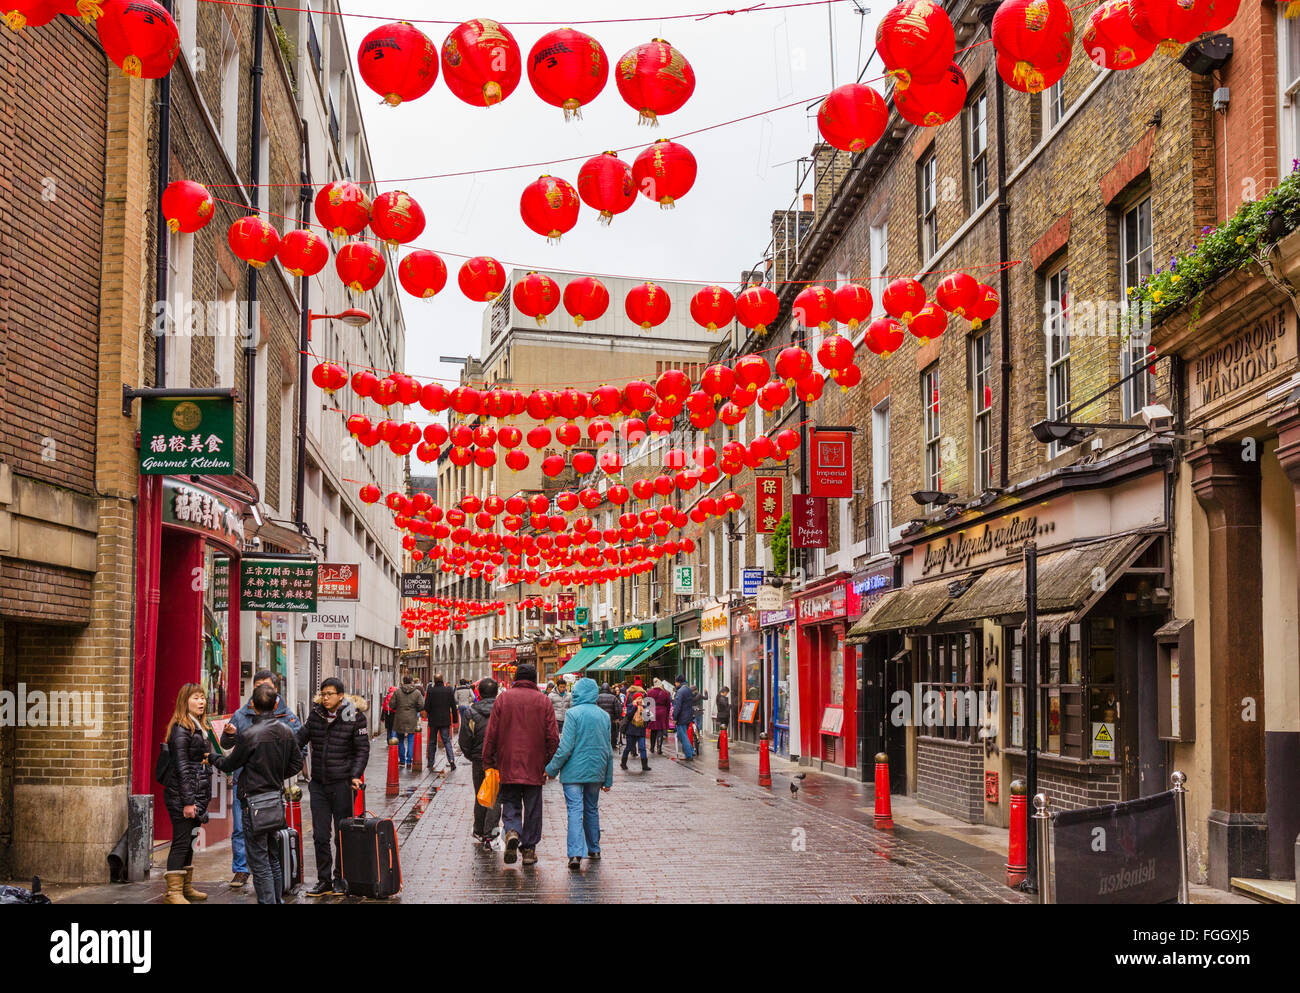 Lisle Street decorated for Chinese New Year in February 2016, Chinatown, Soho, London, England, UK - Stock Image